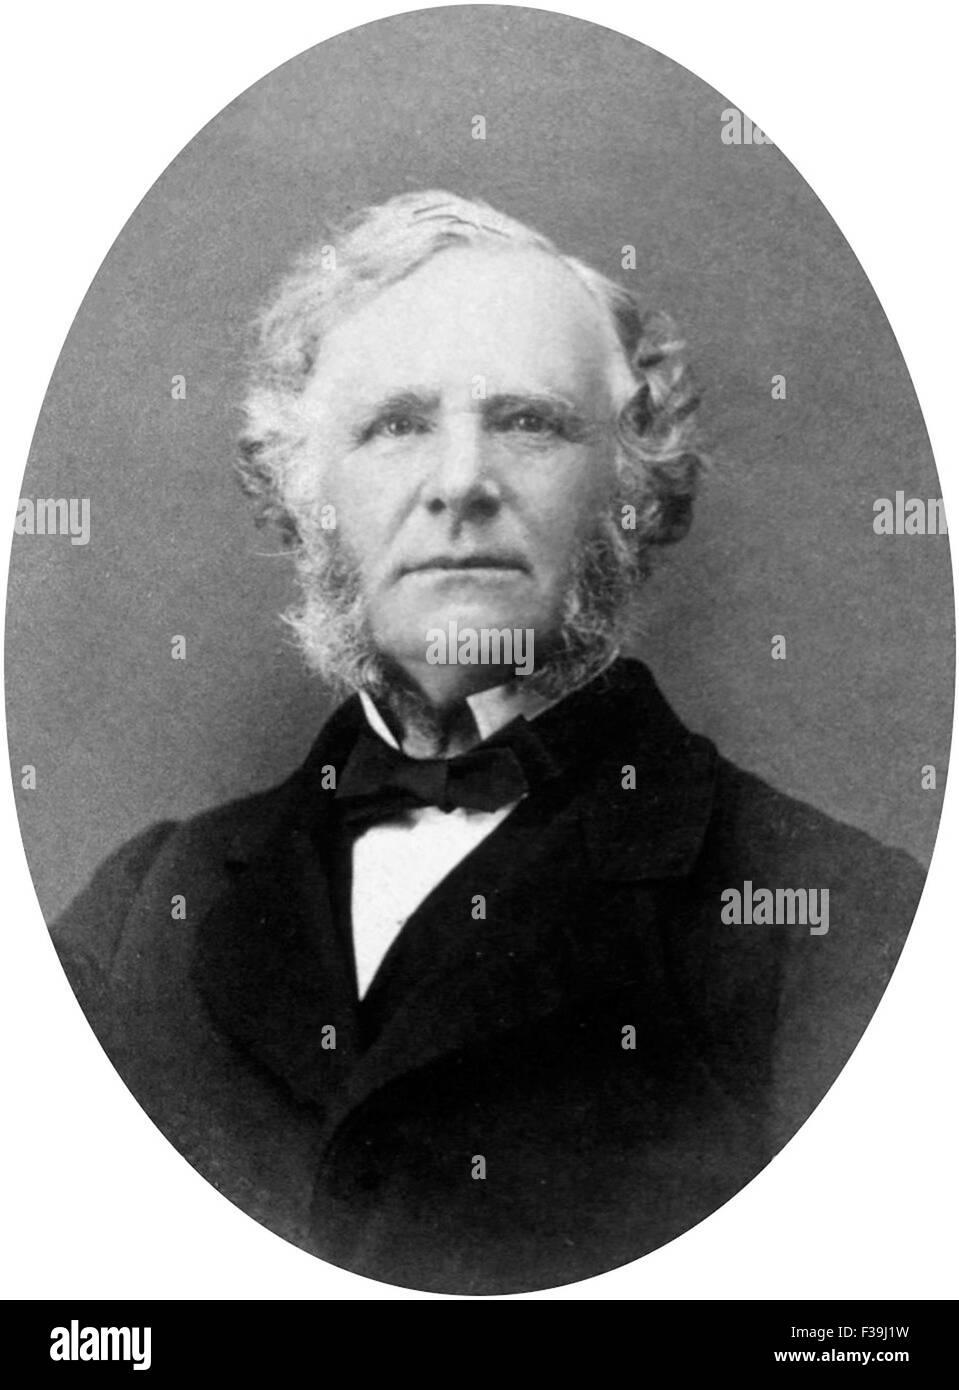 Sir William James Erasmus Wilson, Sir Erasmus Wilson, English surgeon and dermatologist - Stock Image